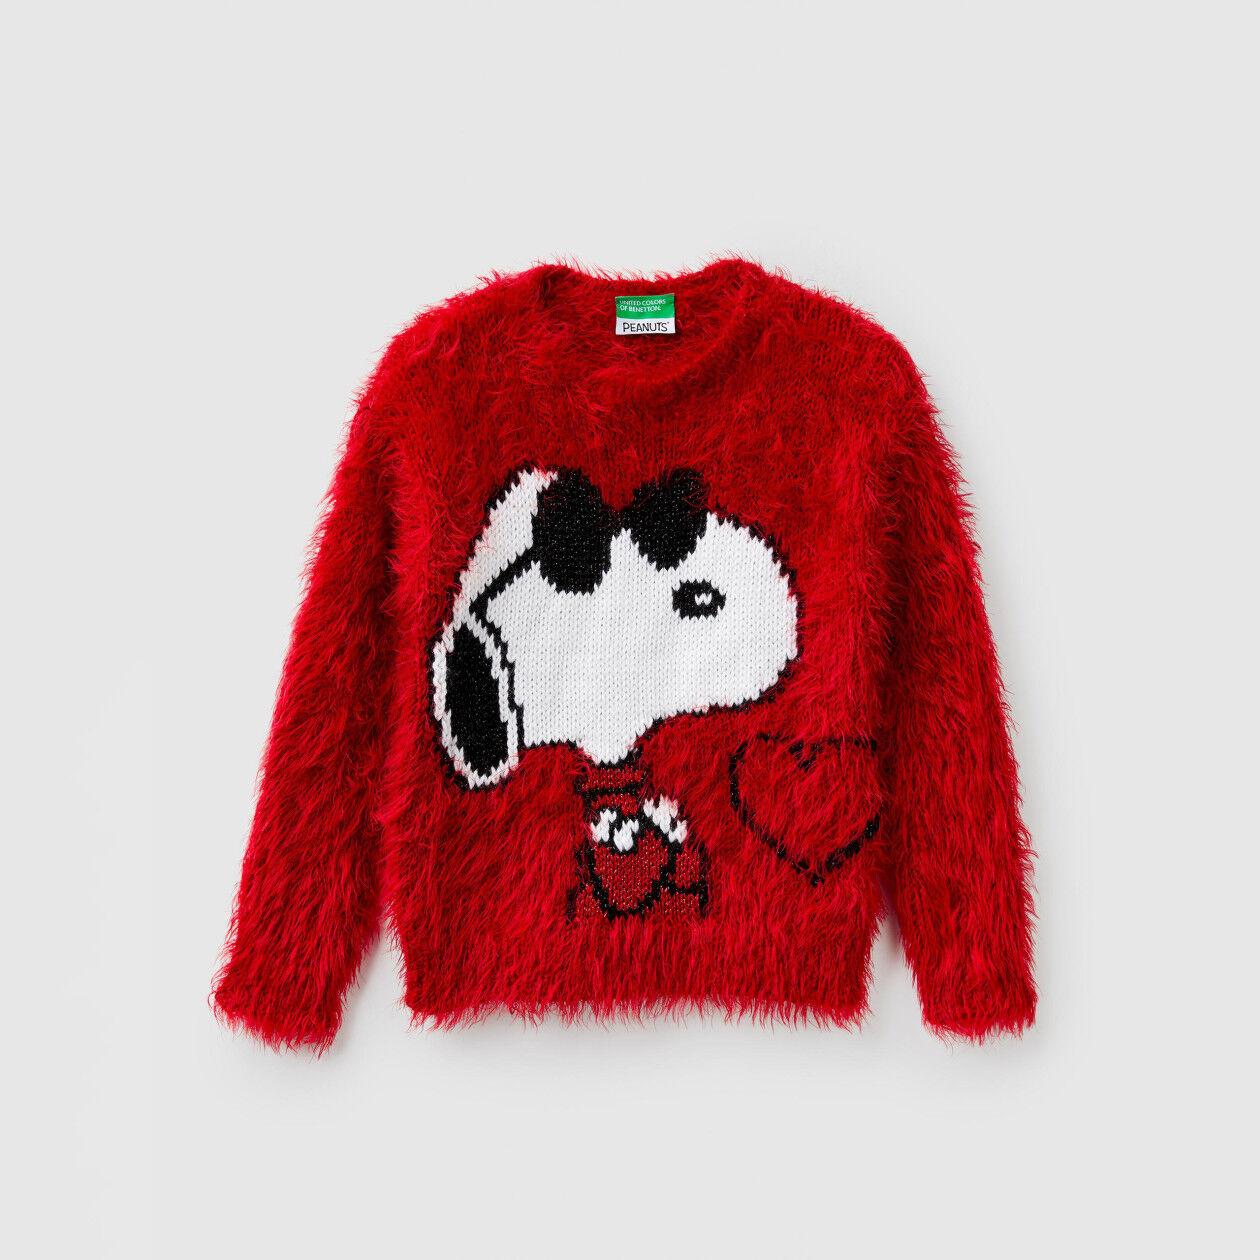 """Snoopy"" sweater"